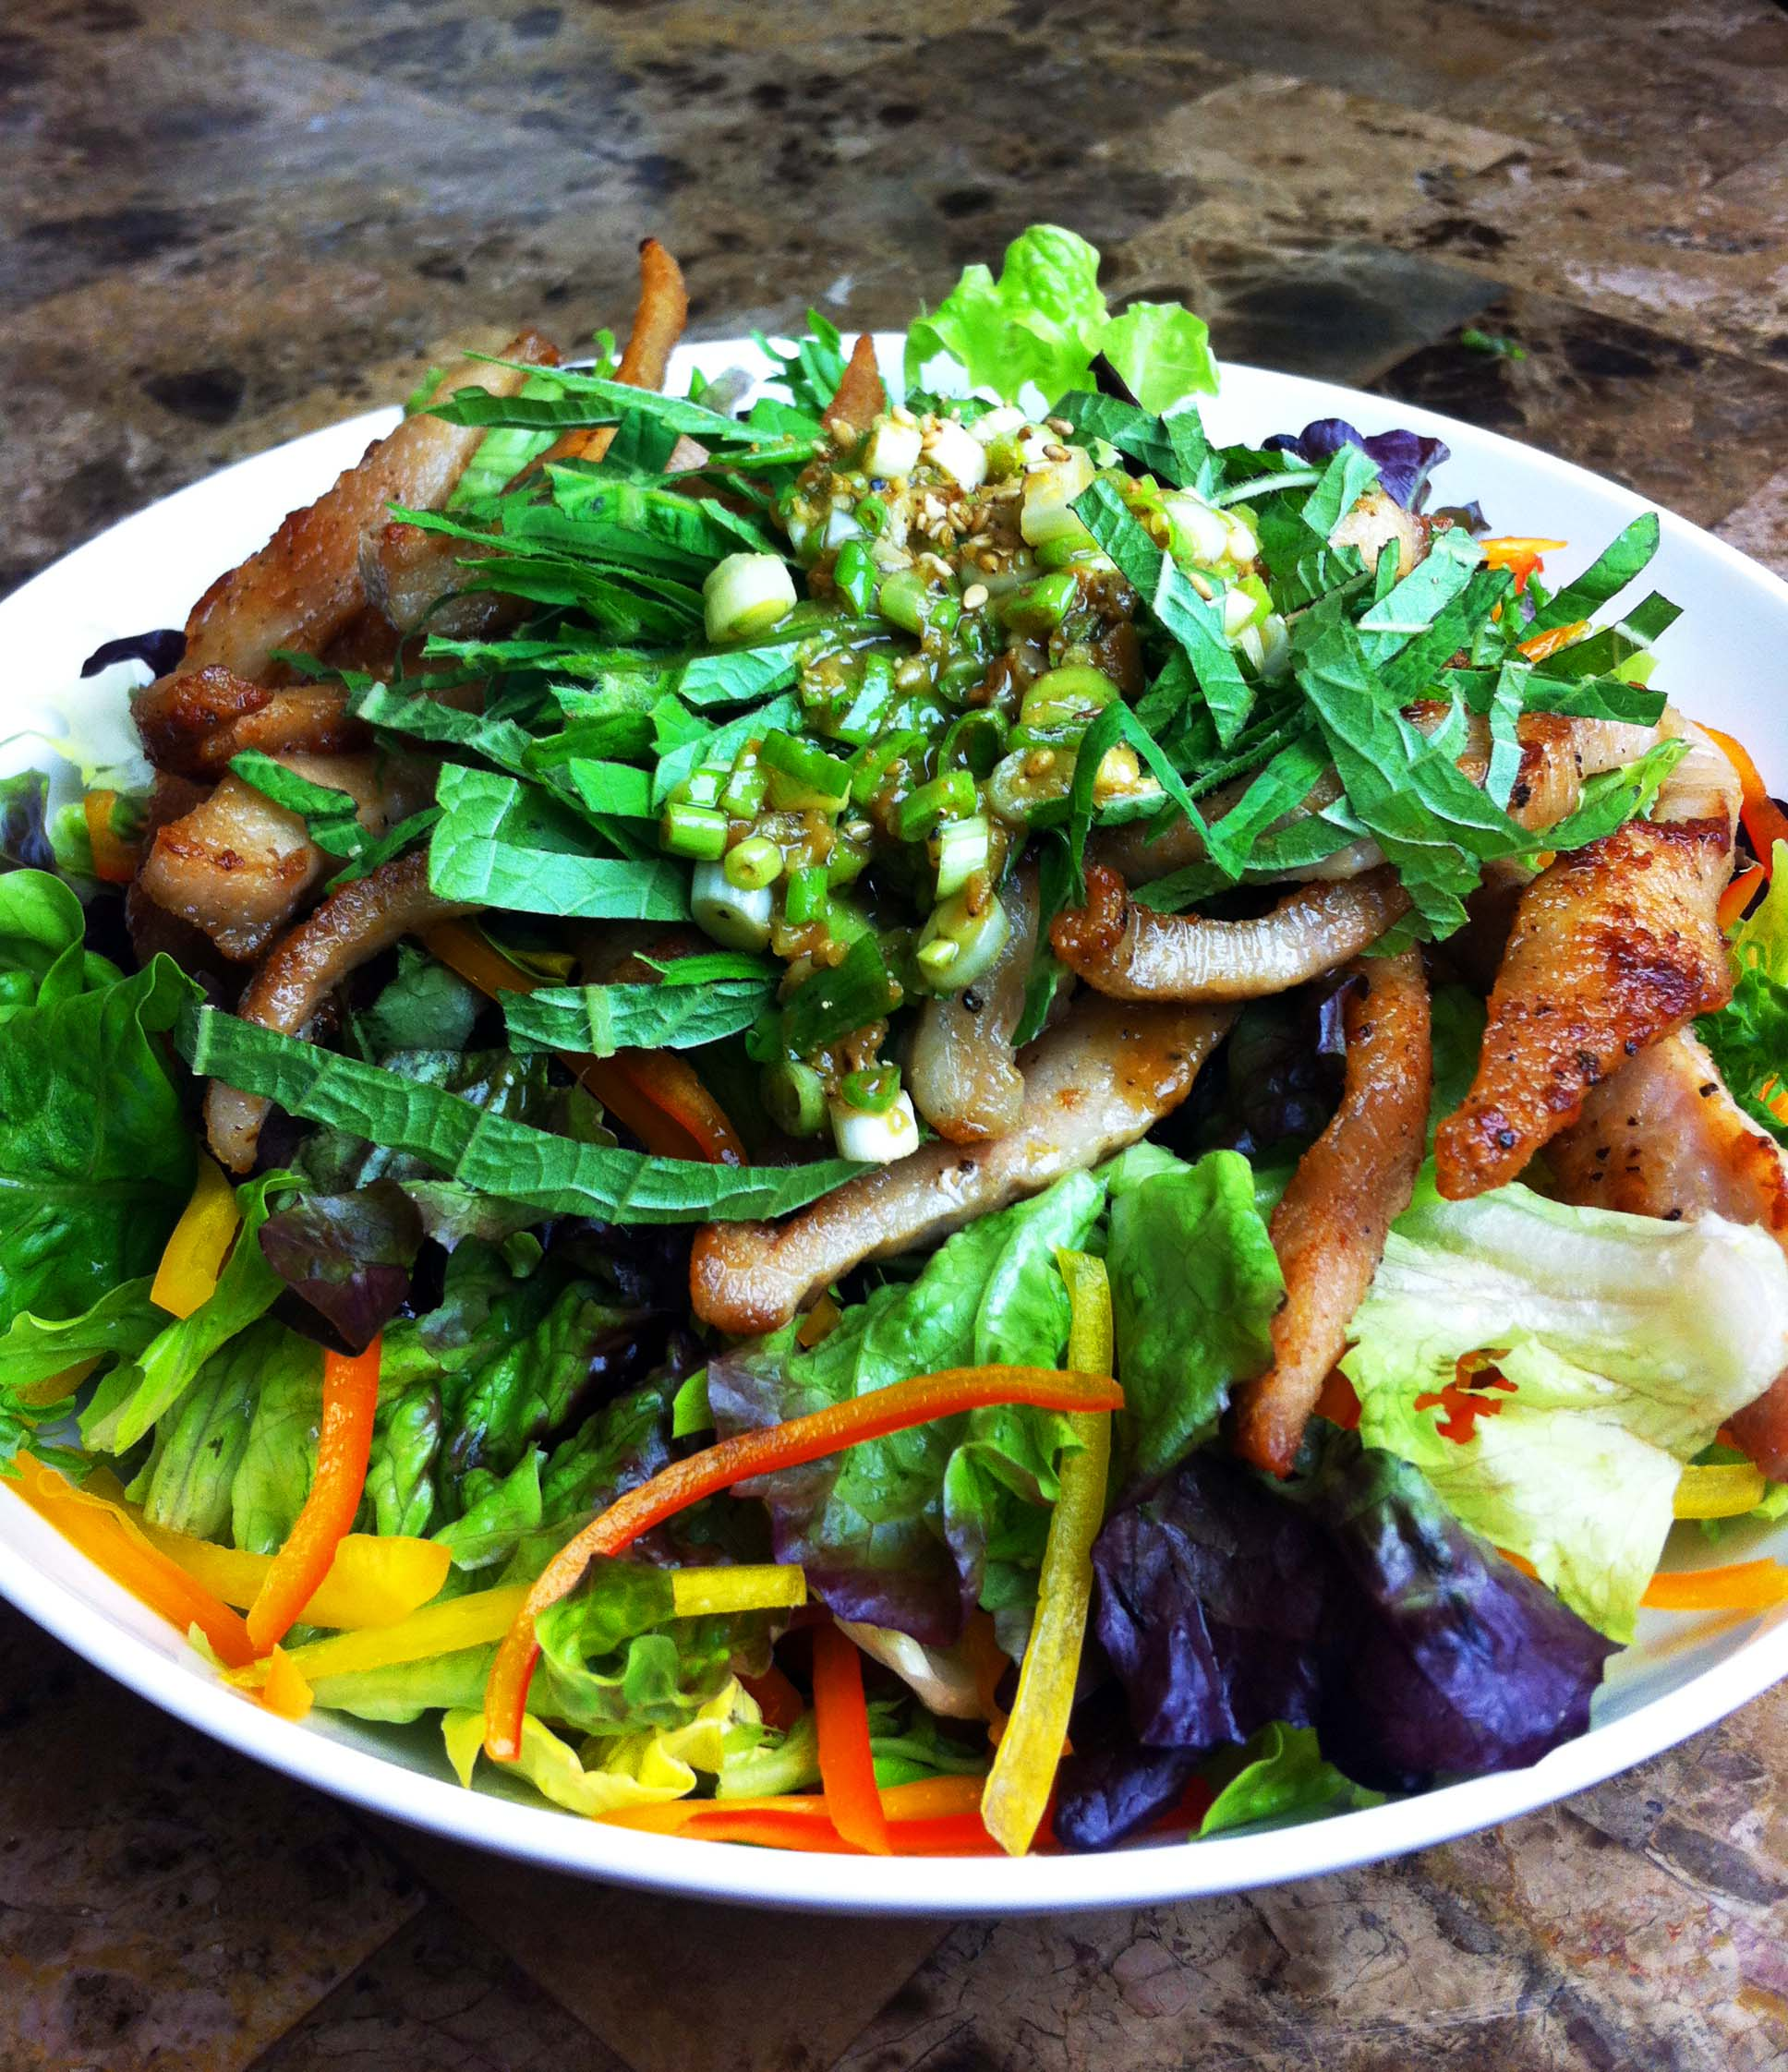 Mixed Green Salad with Crispy Pork Jowl and Doenjang Dressing